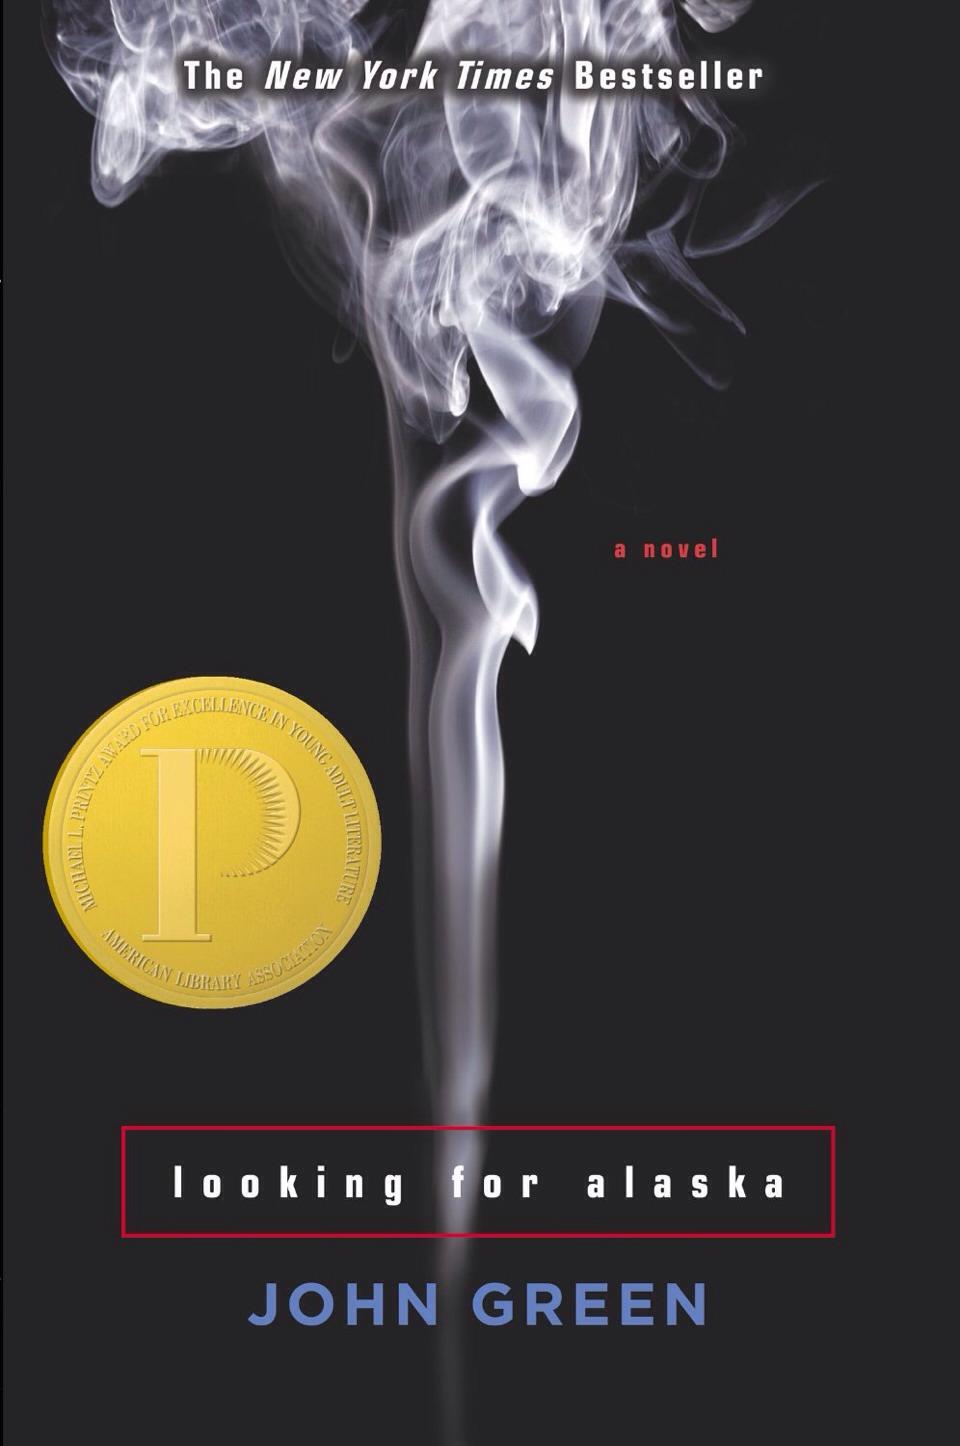 7. Looking for Alaska - John Green